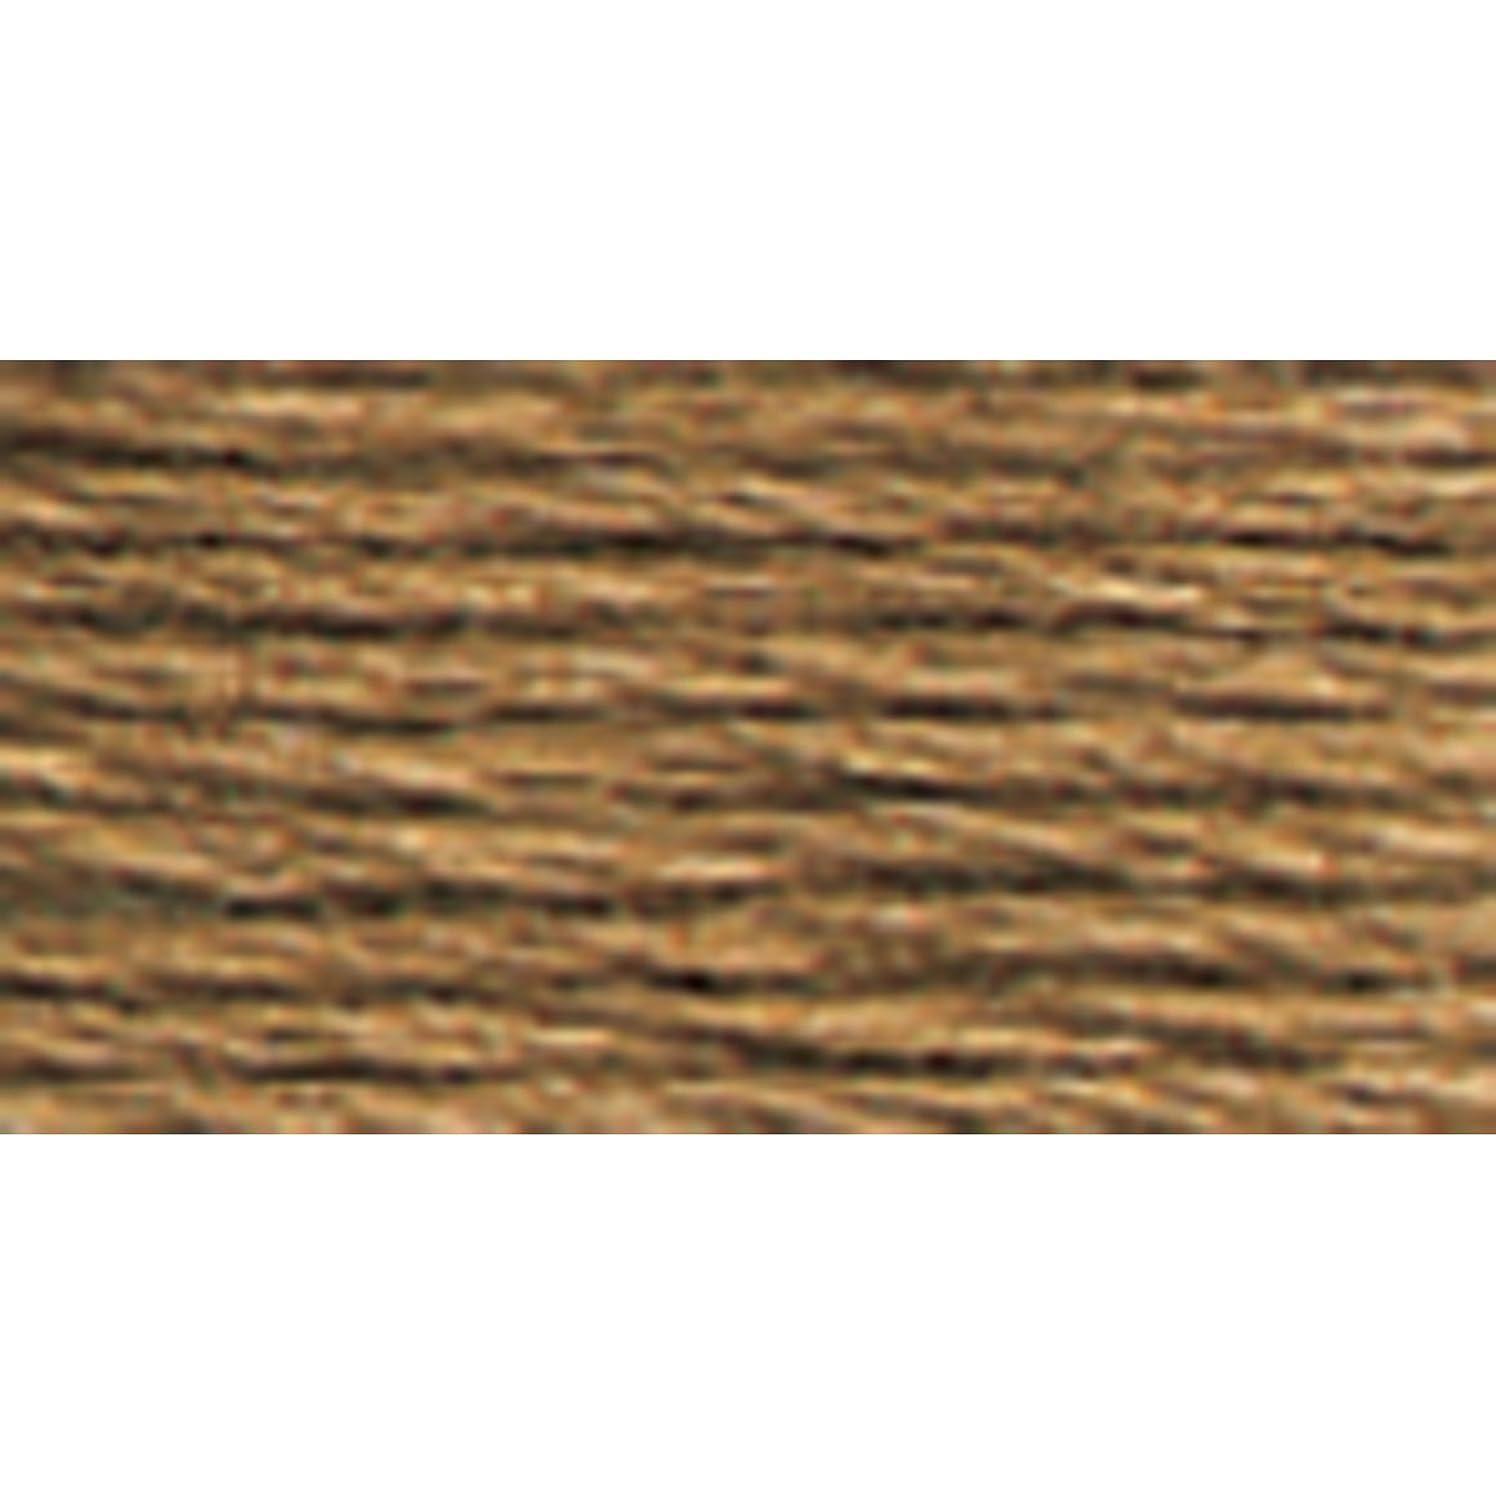 DMC 117-3863 Mouline Stranded Cotton Six Strand Embroidery Floss Thread, Medium Mocha Beige, 8.7-Yard